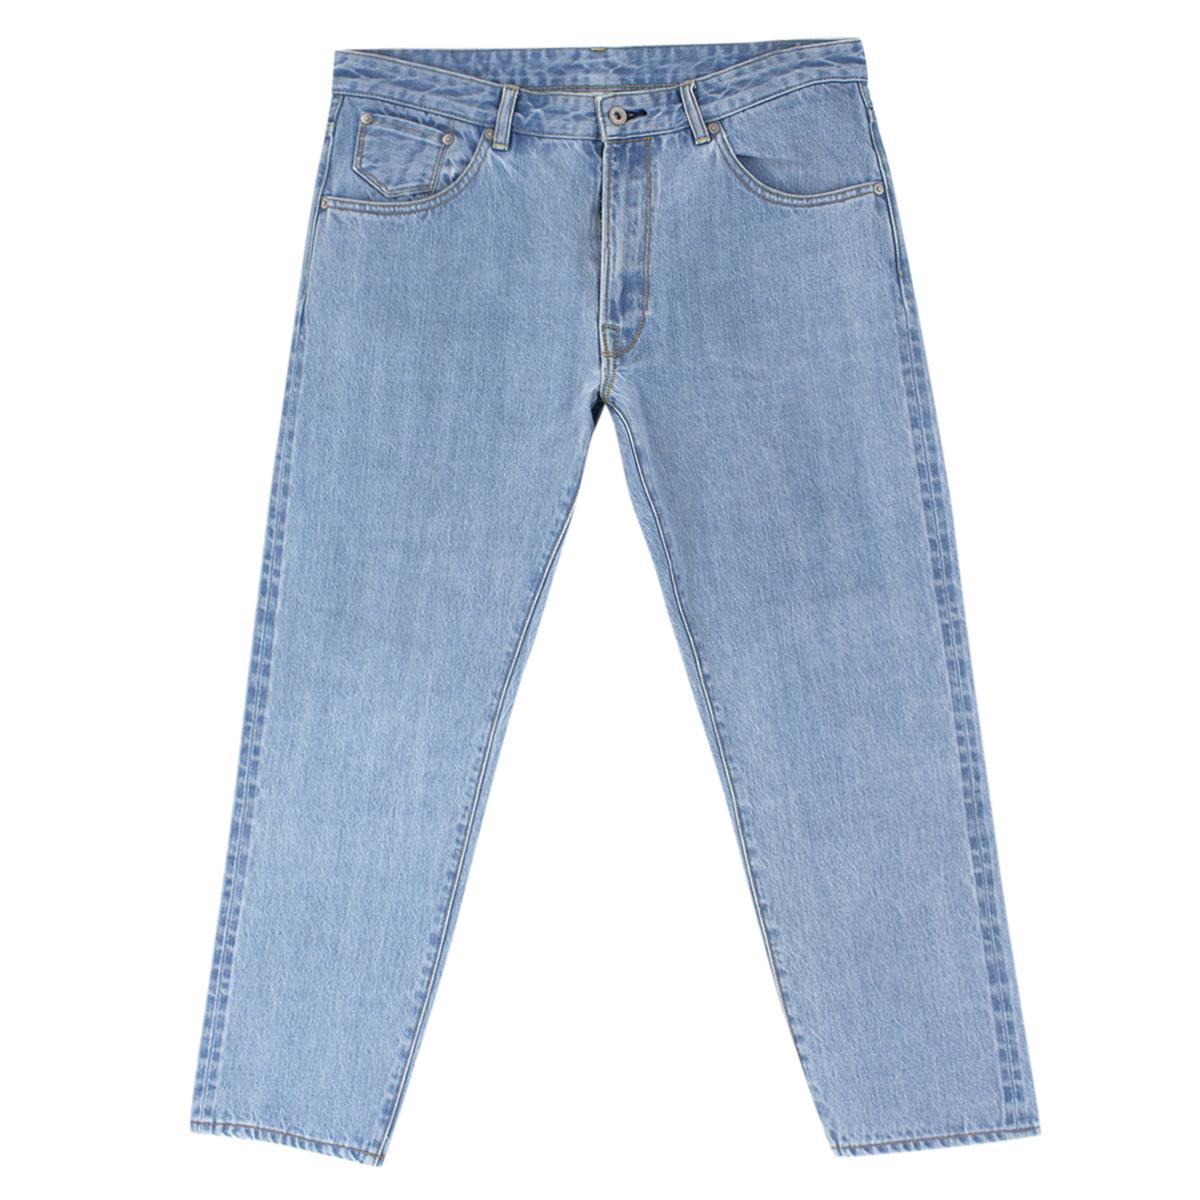 Anglo-Italian Denim Jeans